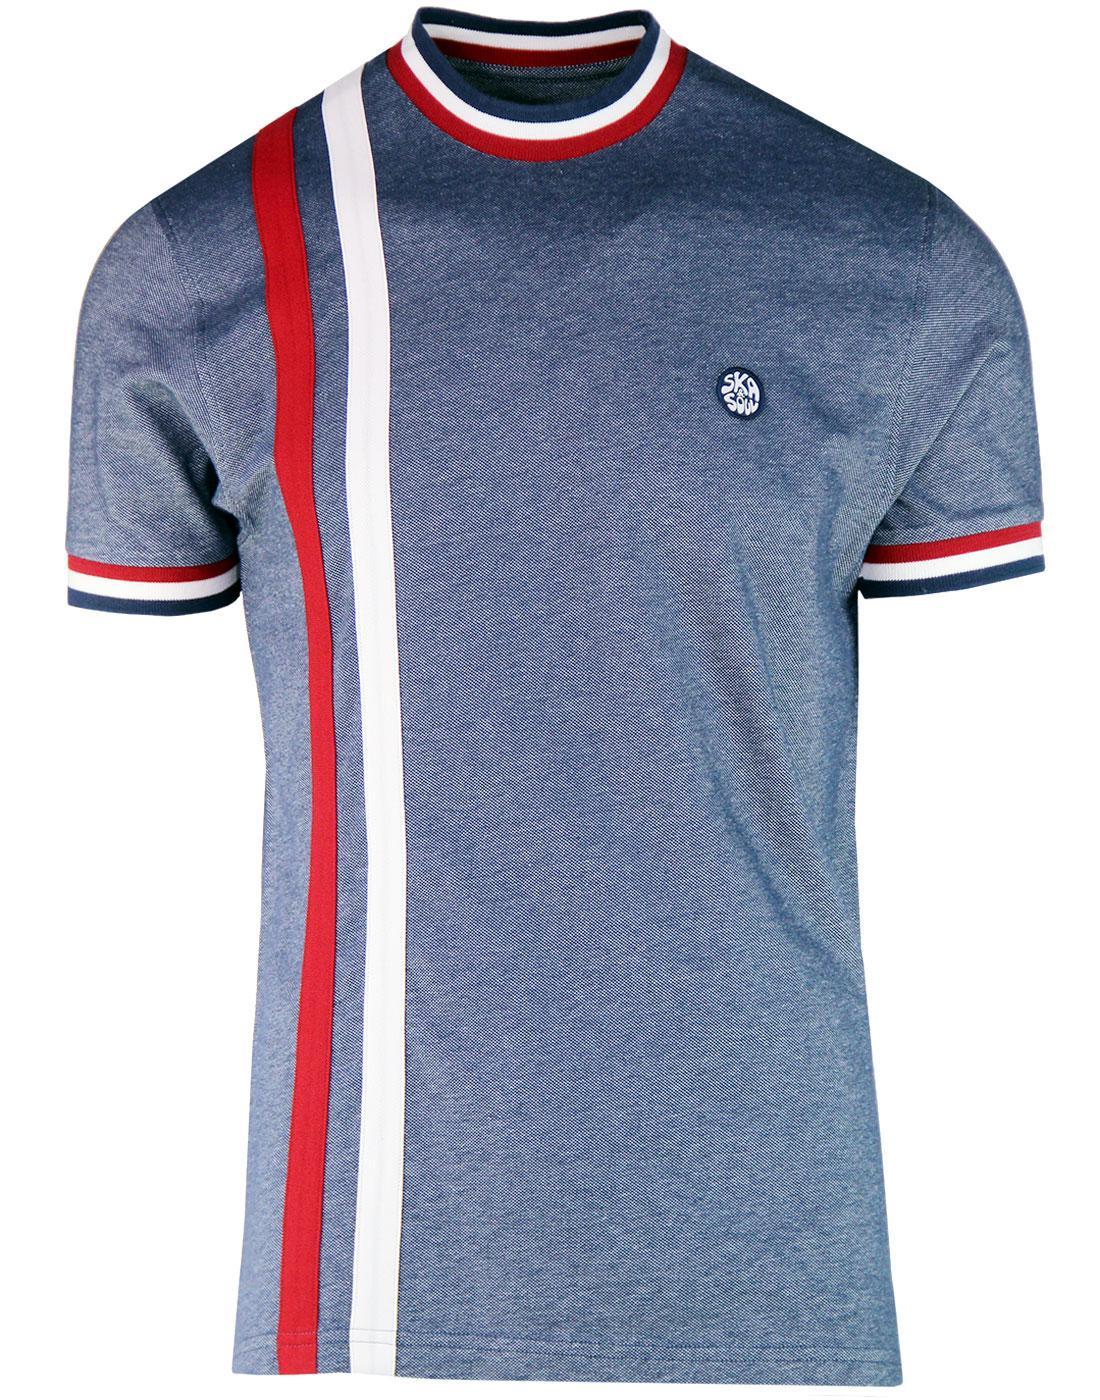 SKA & SOUL Mod Racing Stripe Oxford Pique T-shirt